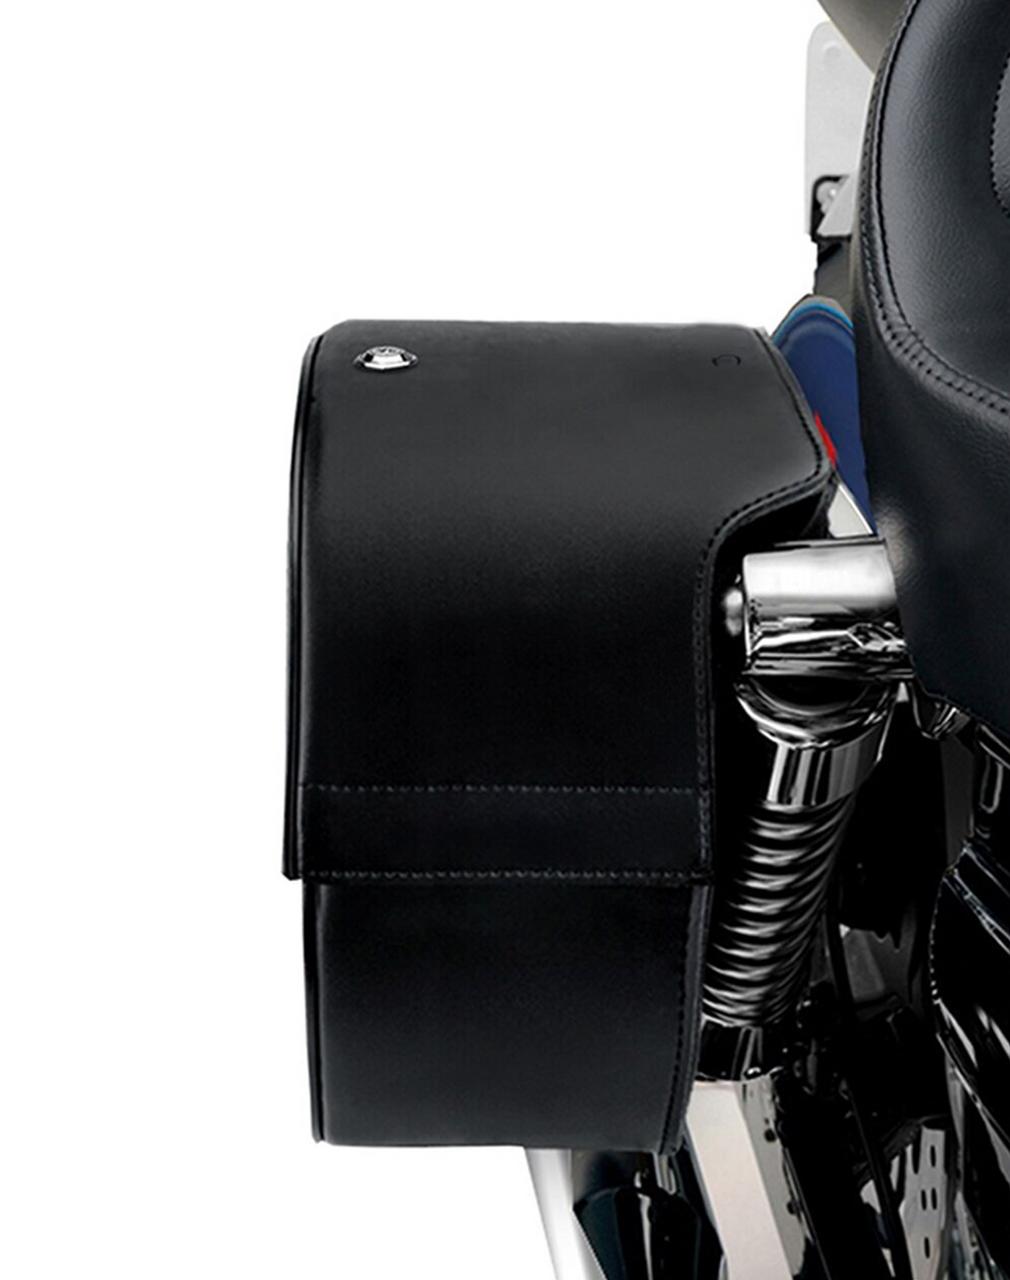 Viking Shock Cutout Warrior Slanted Large Motorcycle Saddlebags For Harley Dyna Switchback Shock Cutout View